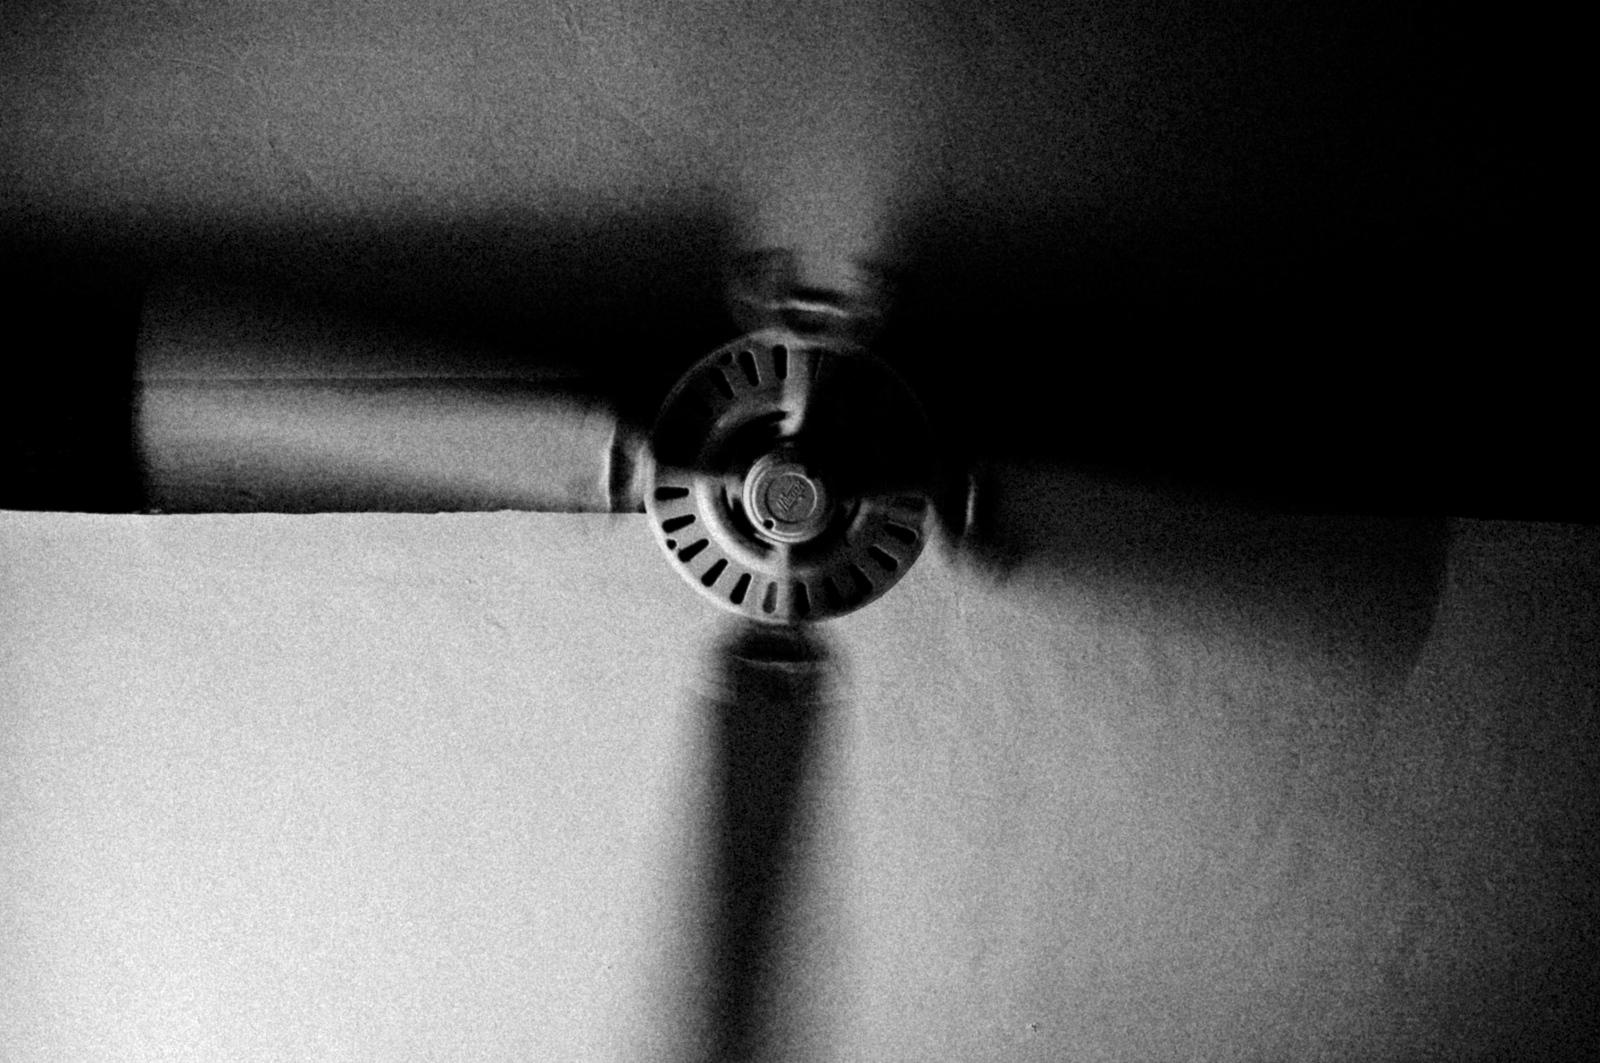 Art and Documentary Photography - Loading 18122006-331400250_9e60f59ce1_o.jpg